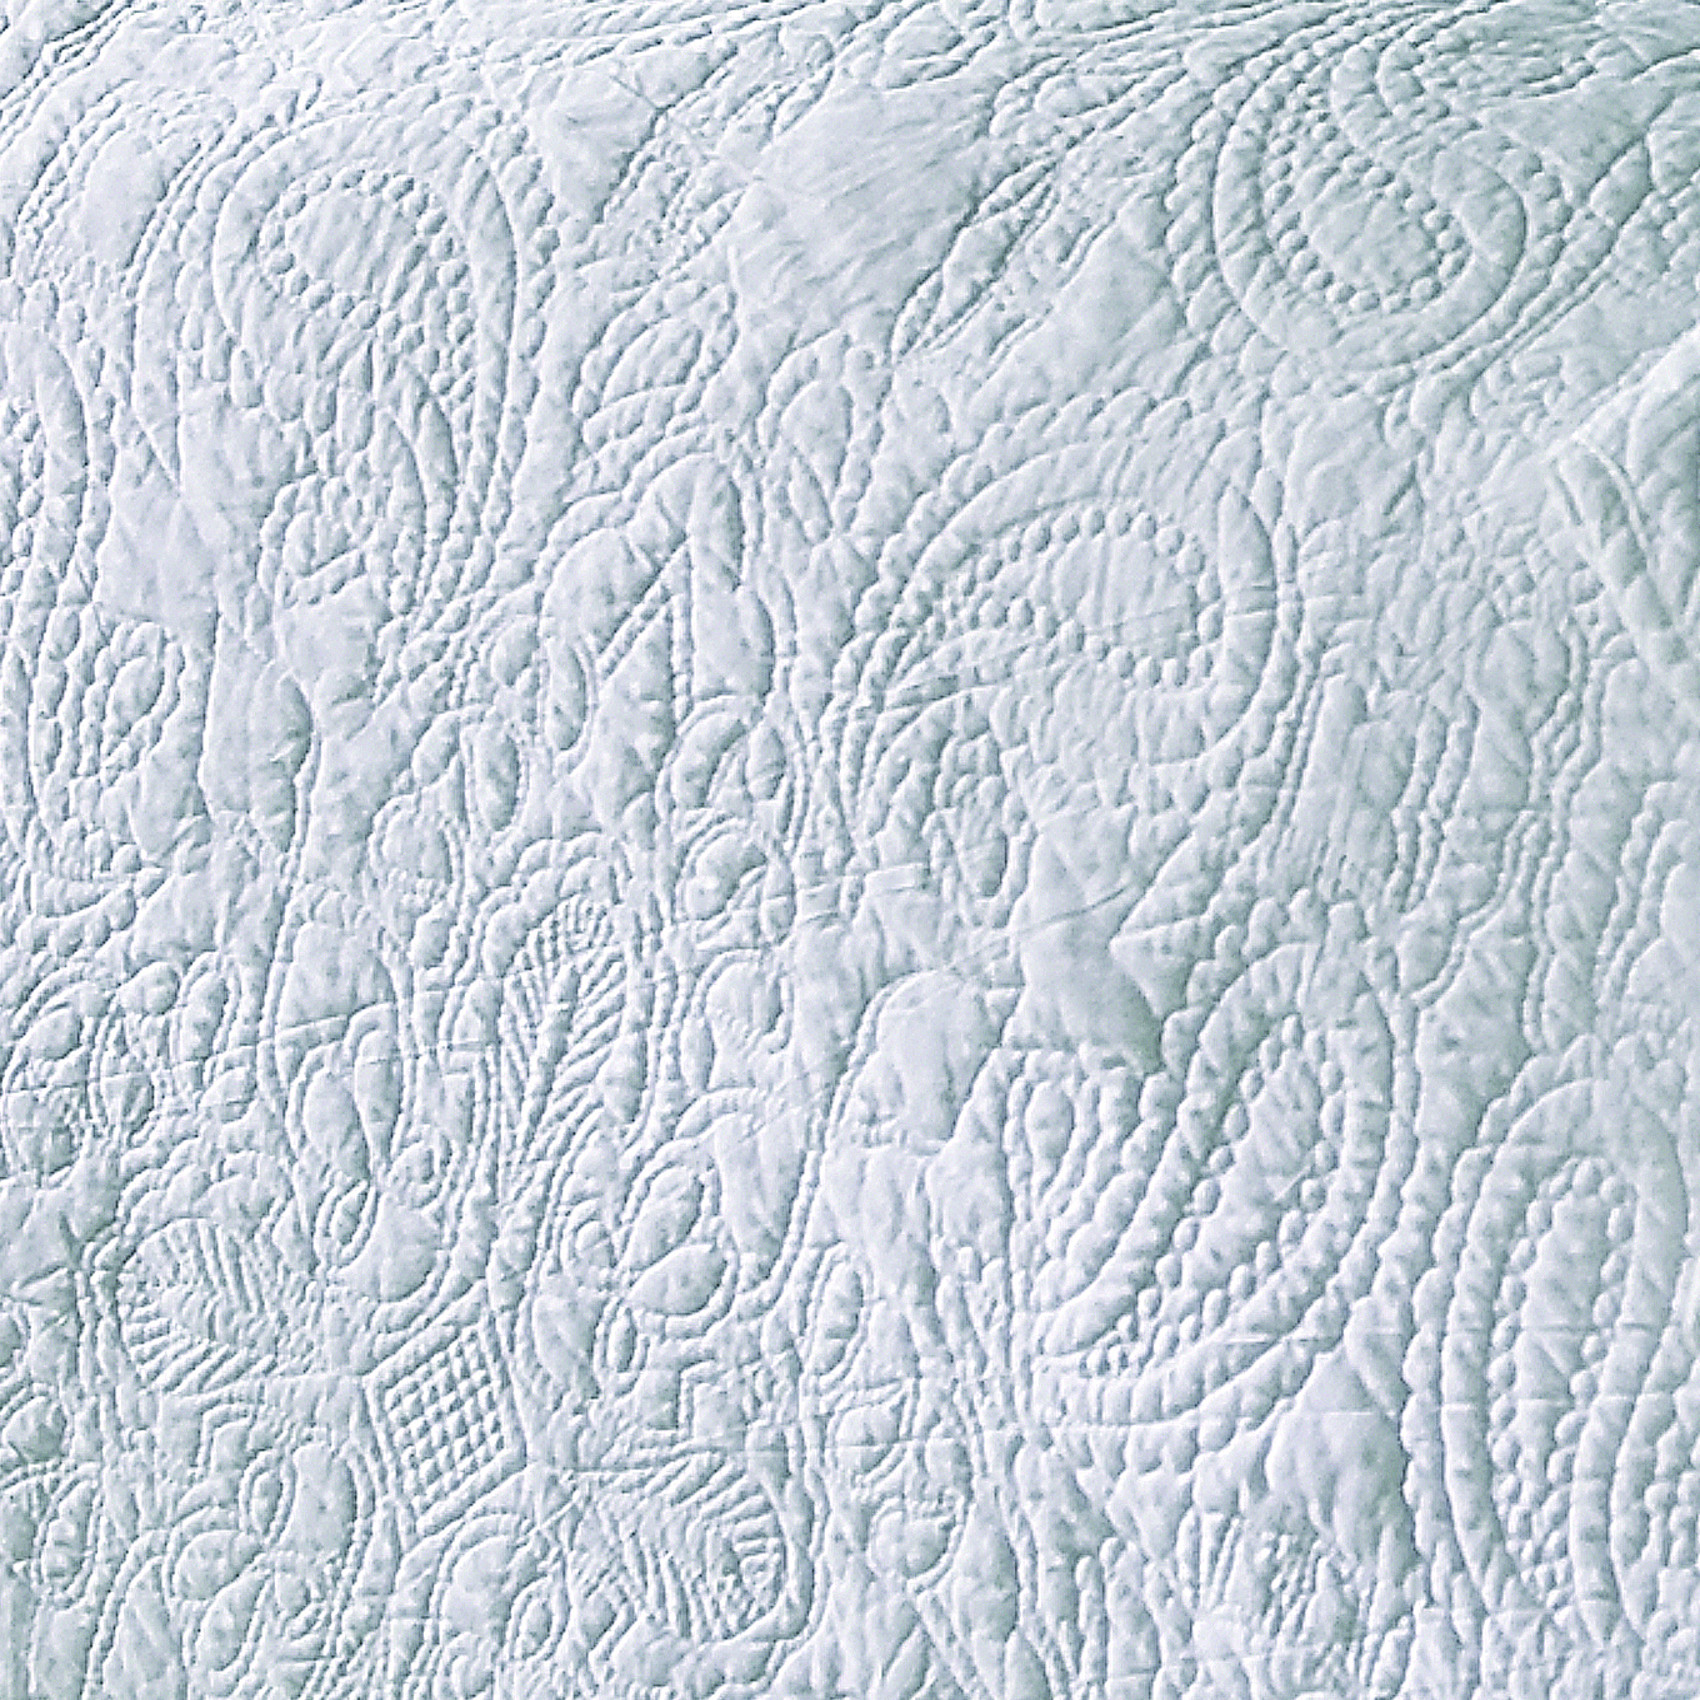 Bedspread designs texture - Sashi Lyon Paisley Design Bedspread Pillow Sham Set Luxury